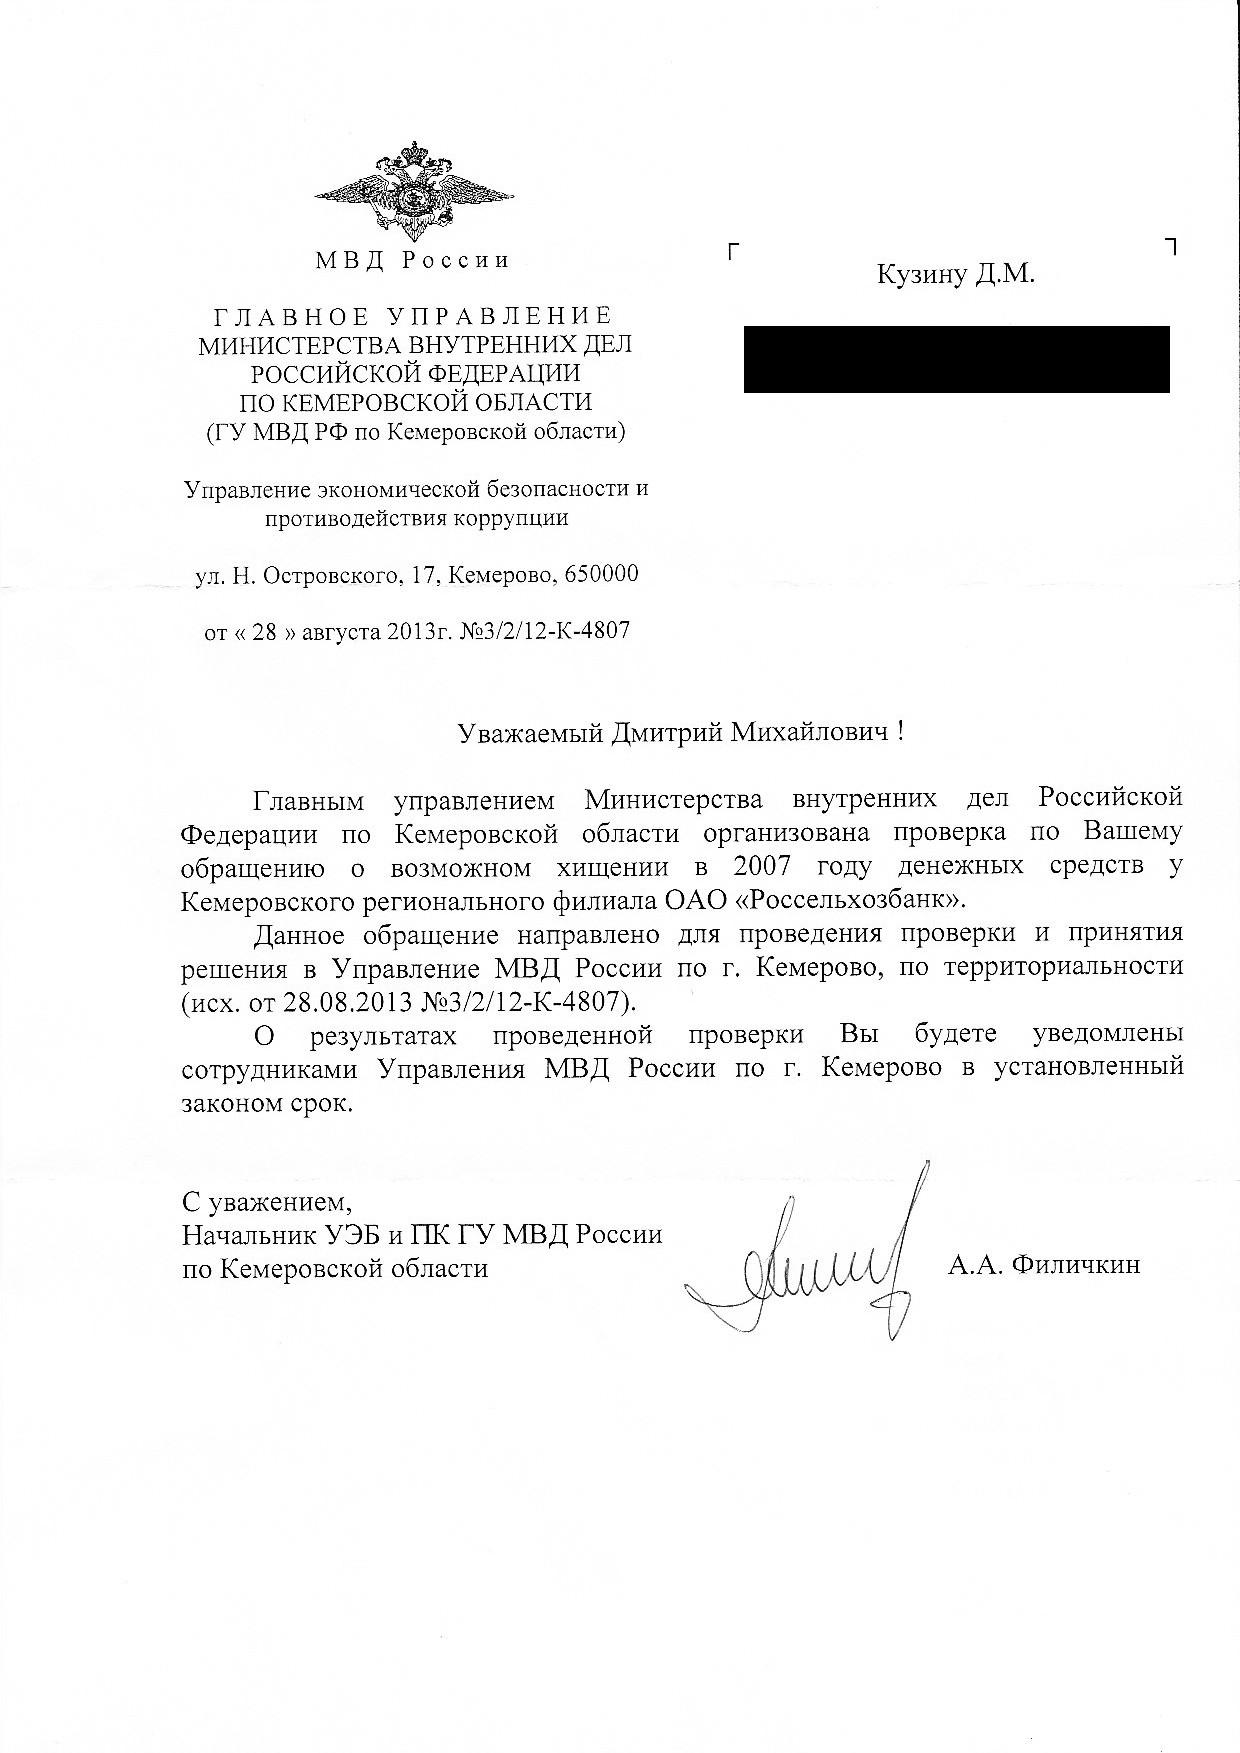 Письмо А А Филичкина от 28 августа 2013 года